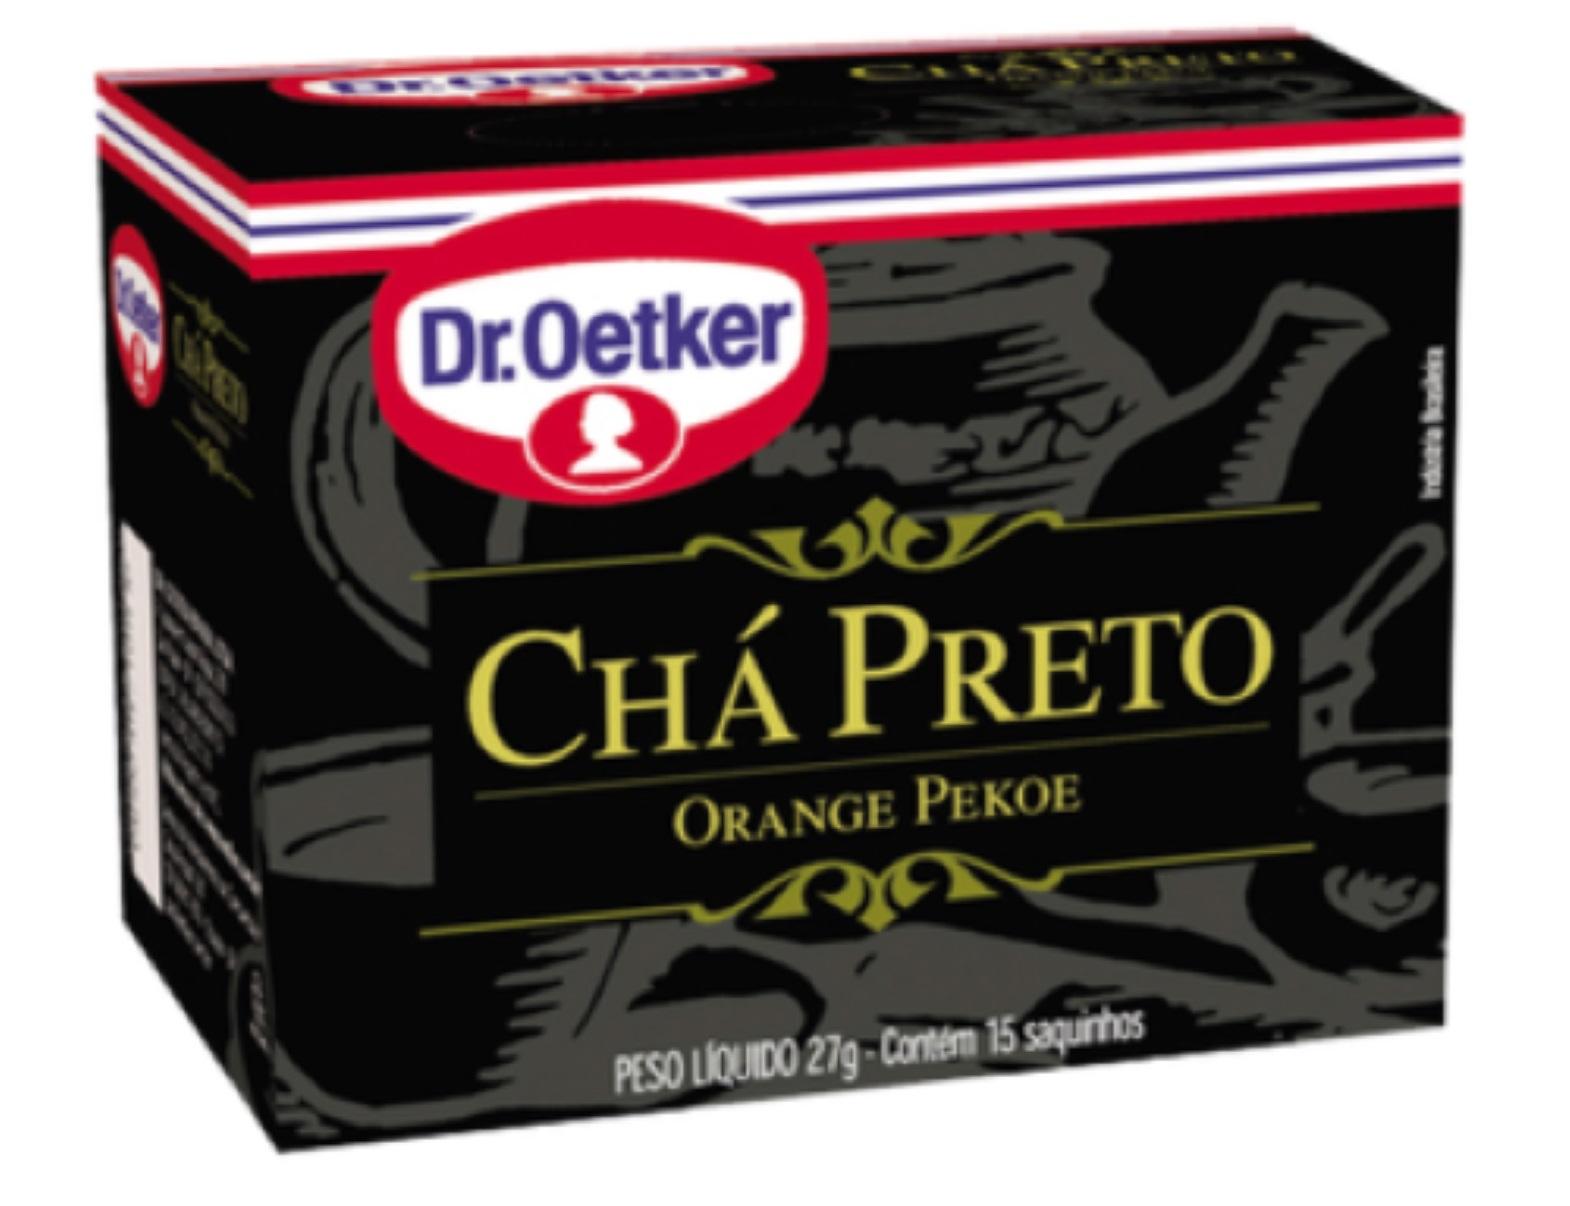 CHÁ PRETO DR. OETKER KIT COM 2 CAIXAS